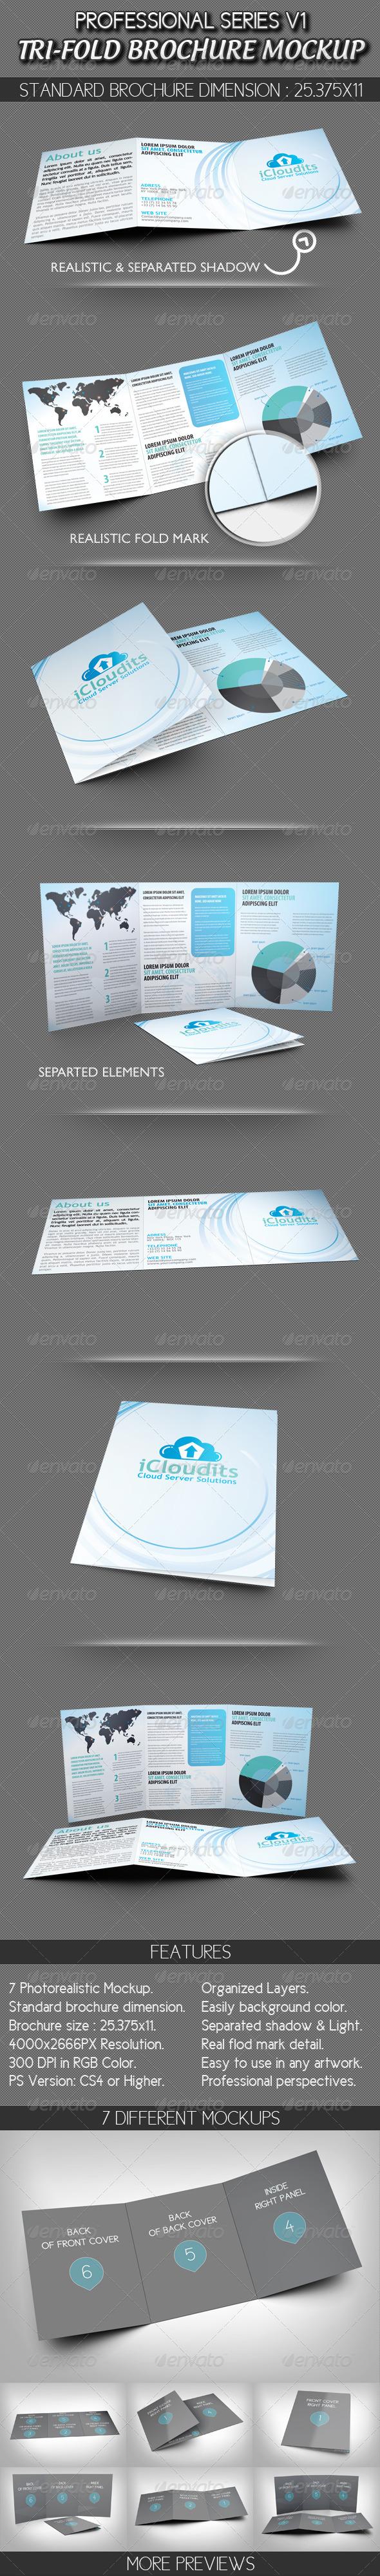 Professional Tri-fold Brochure Mockup V1 - Brochures Print